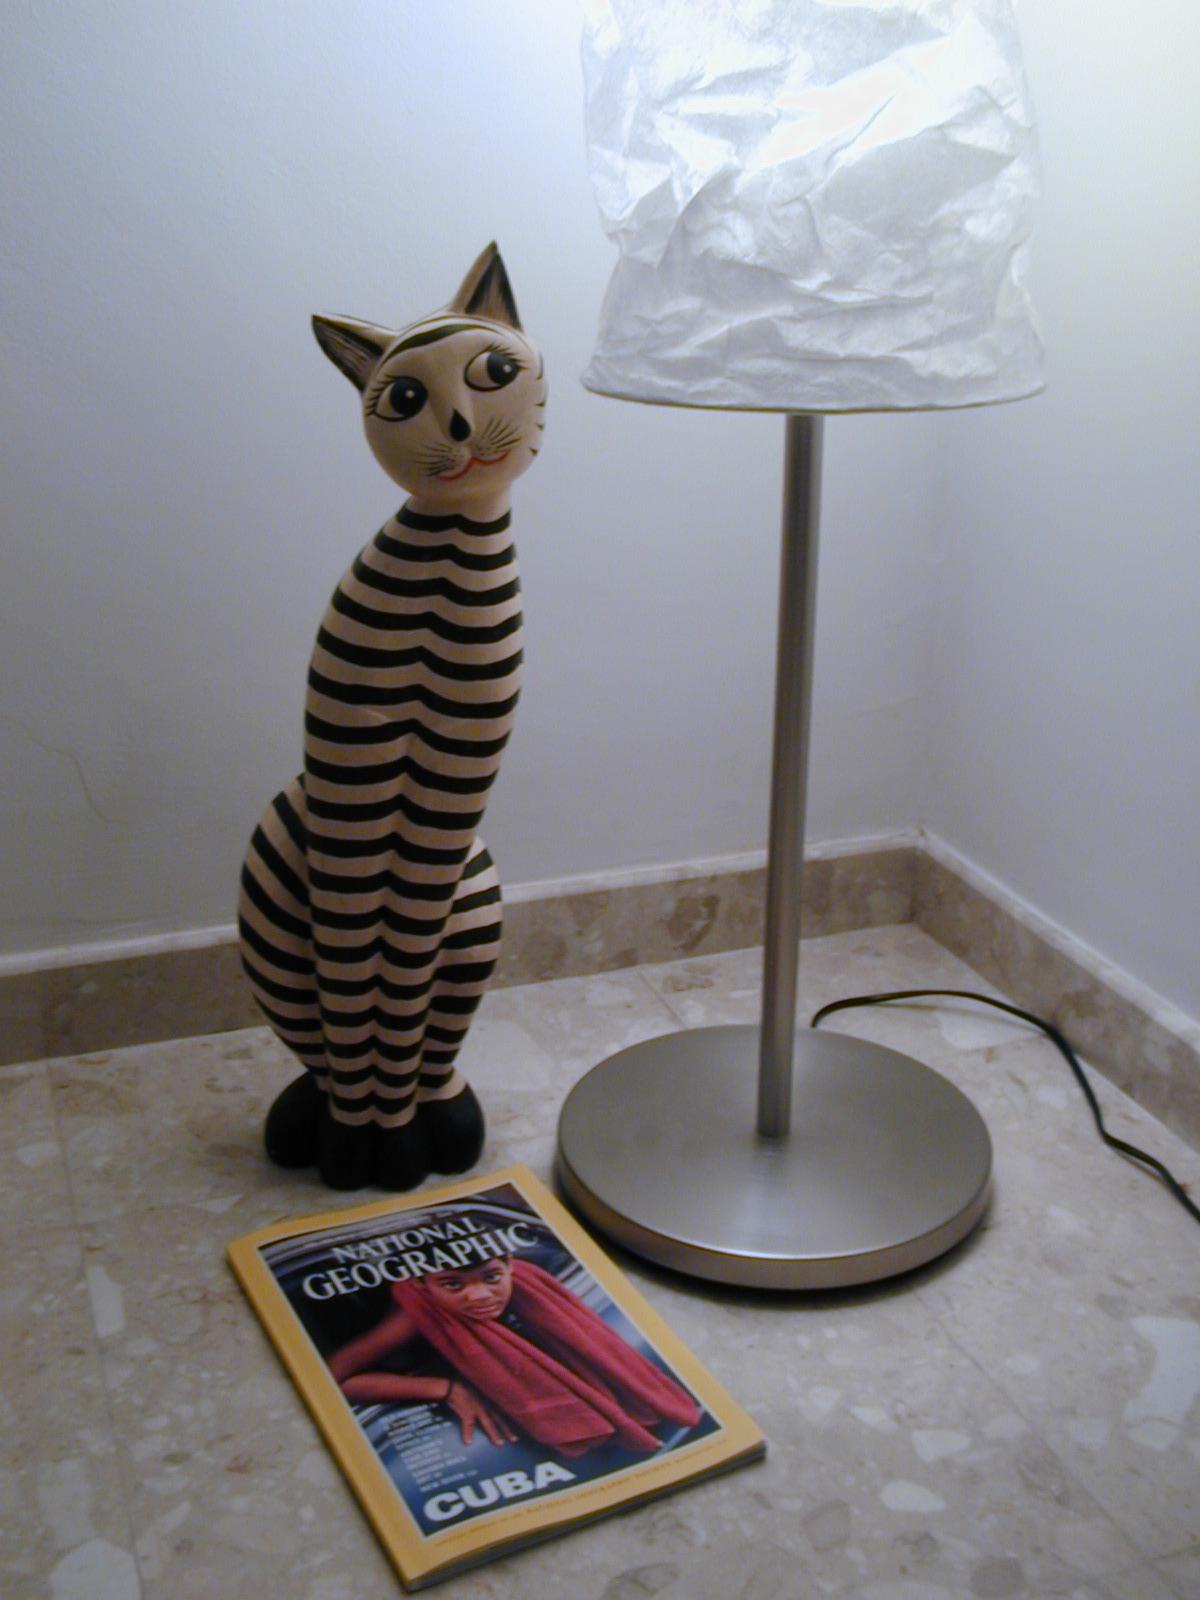 nikon coolpix 700 review digital photography review. Black Bedroom Furniture Sets. Home Design Ideas